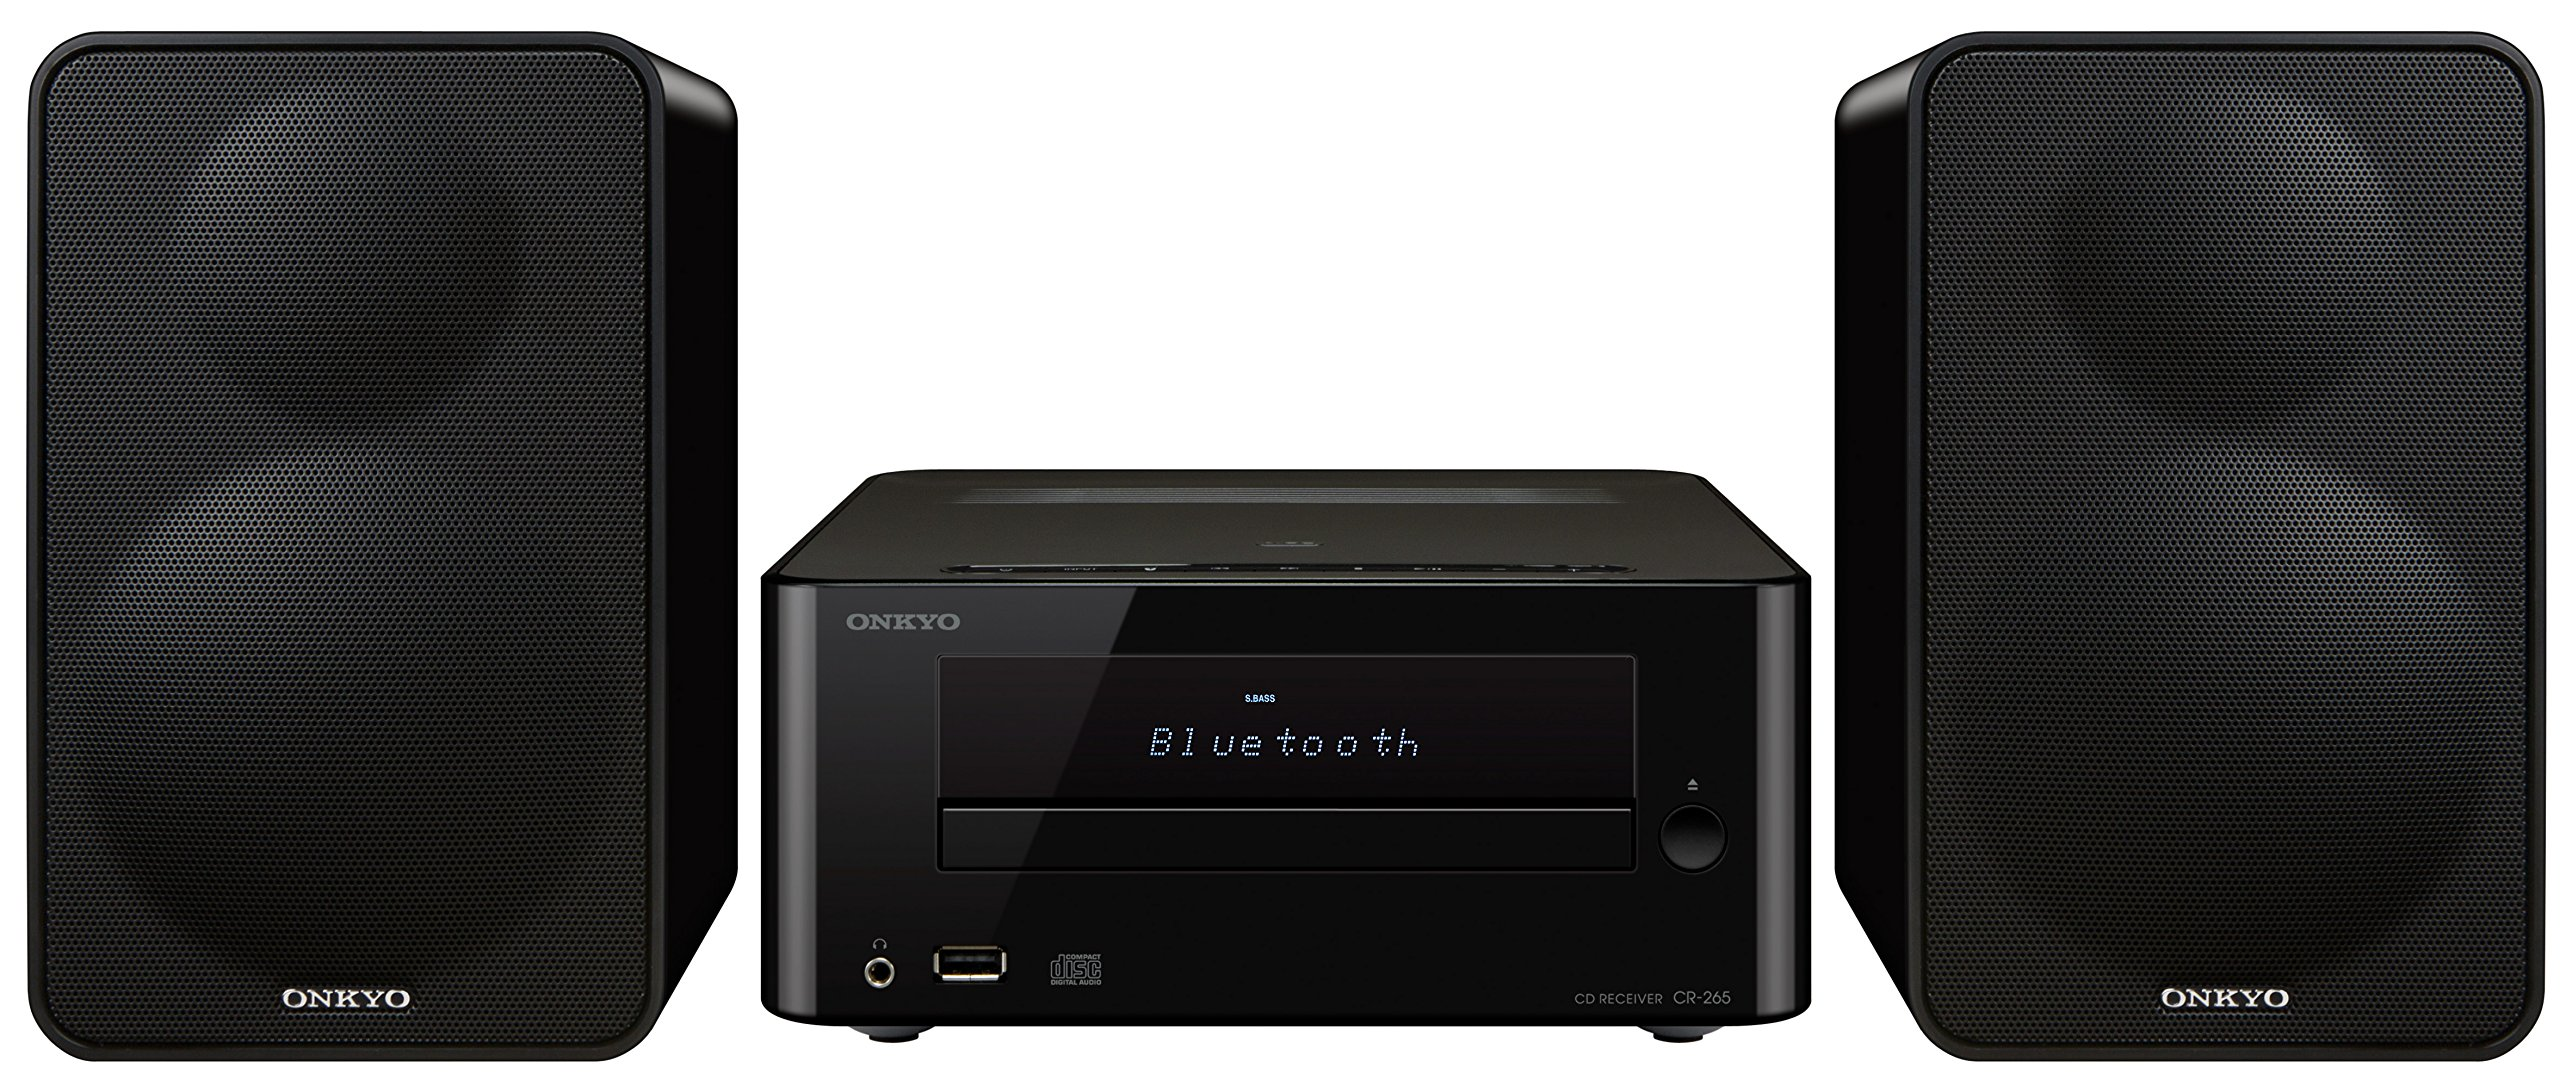 Onkyo CS 265 Hi Fi System Bluetooth